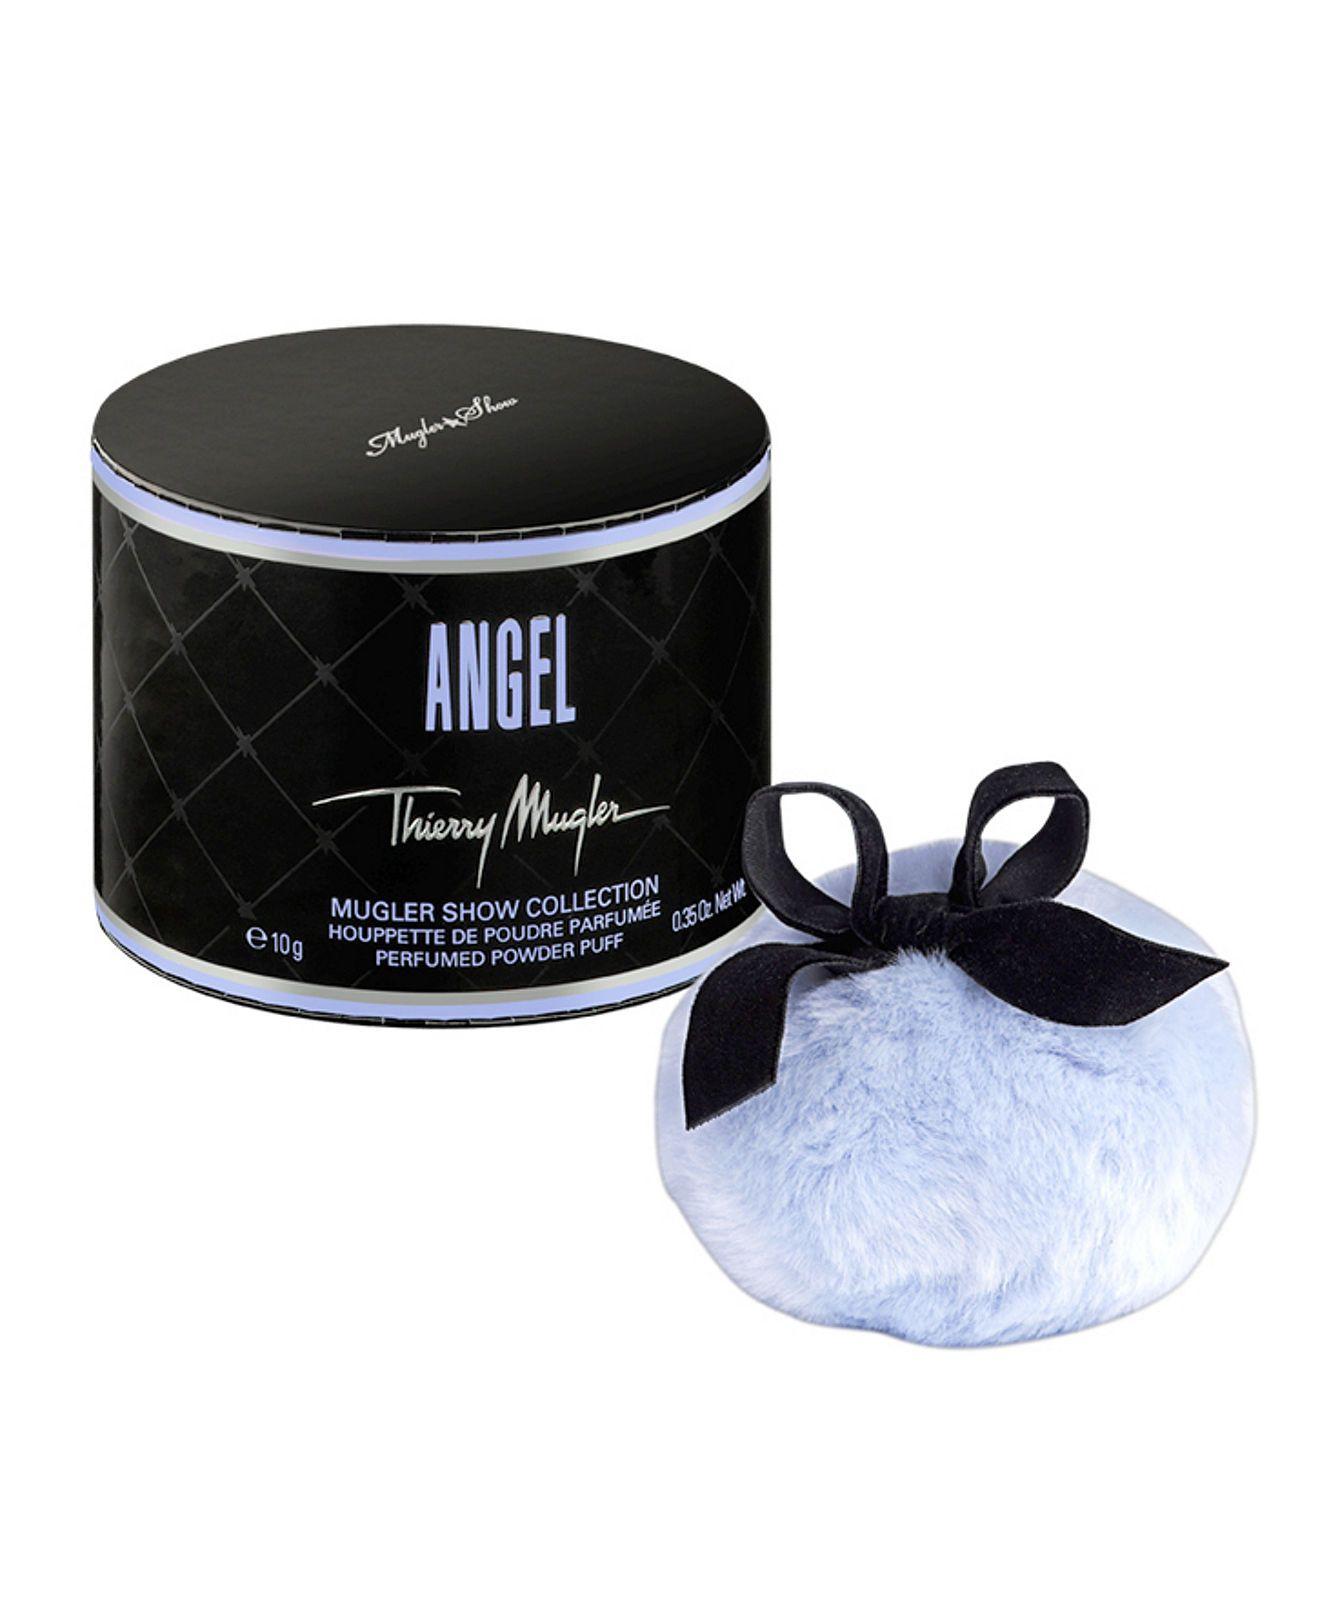 Angel By Thierry Mugler Perfumed Powder Puff Limited Edition Angel